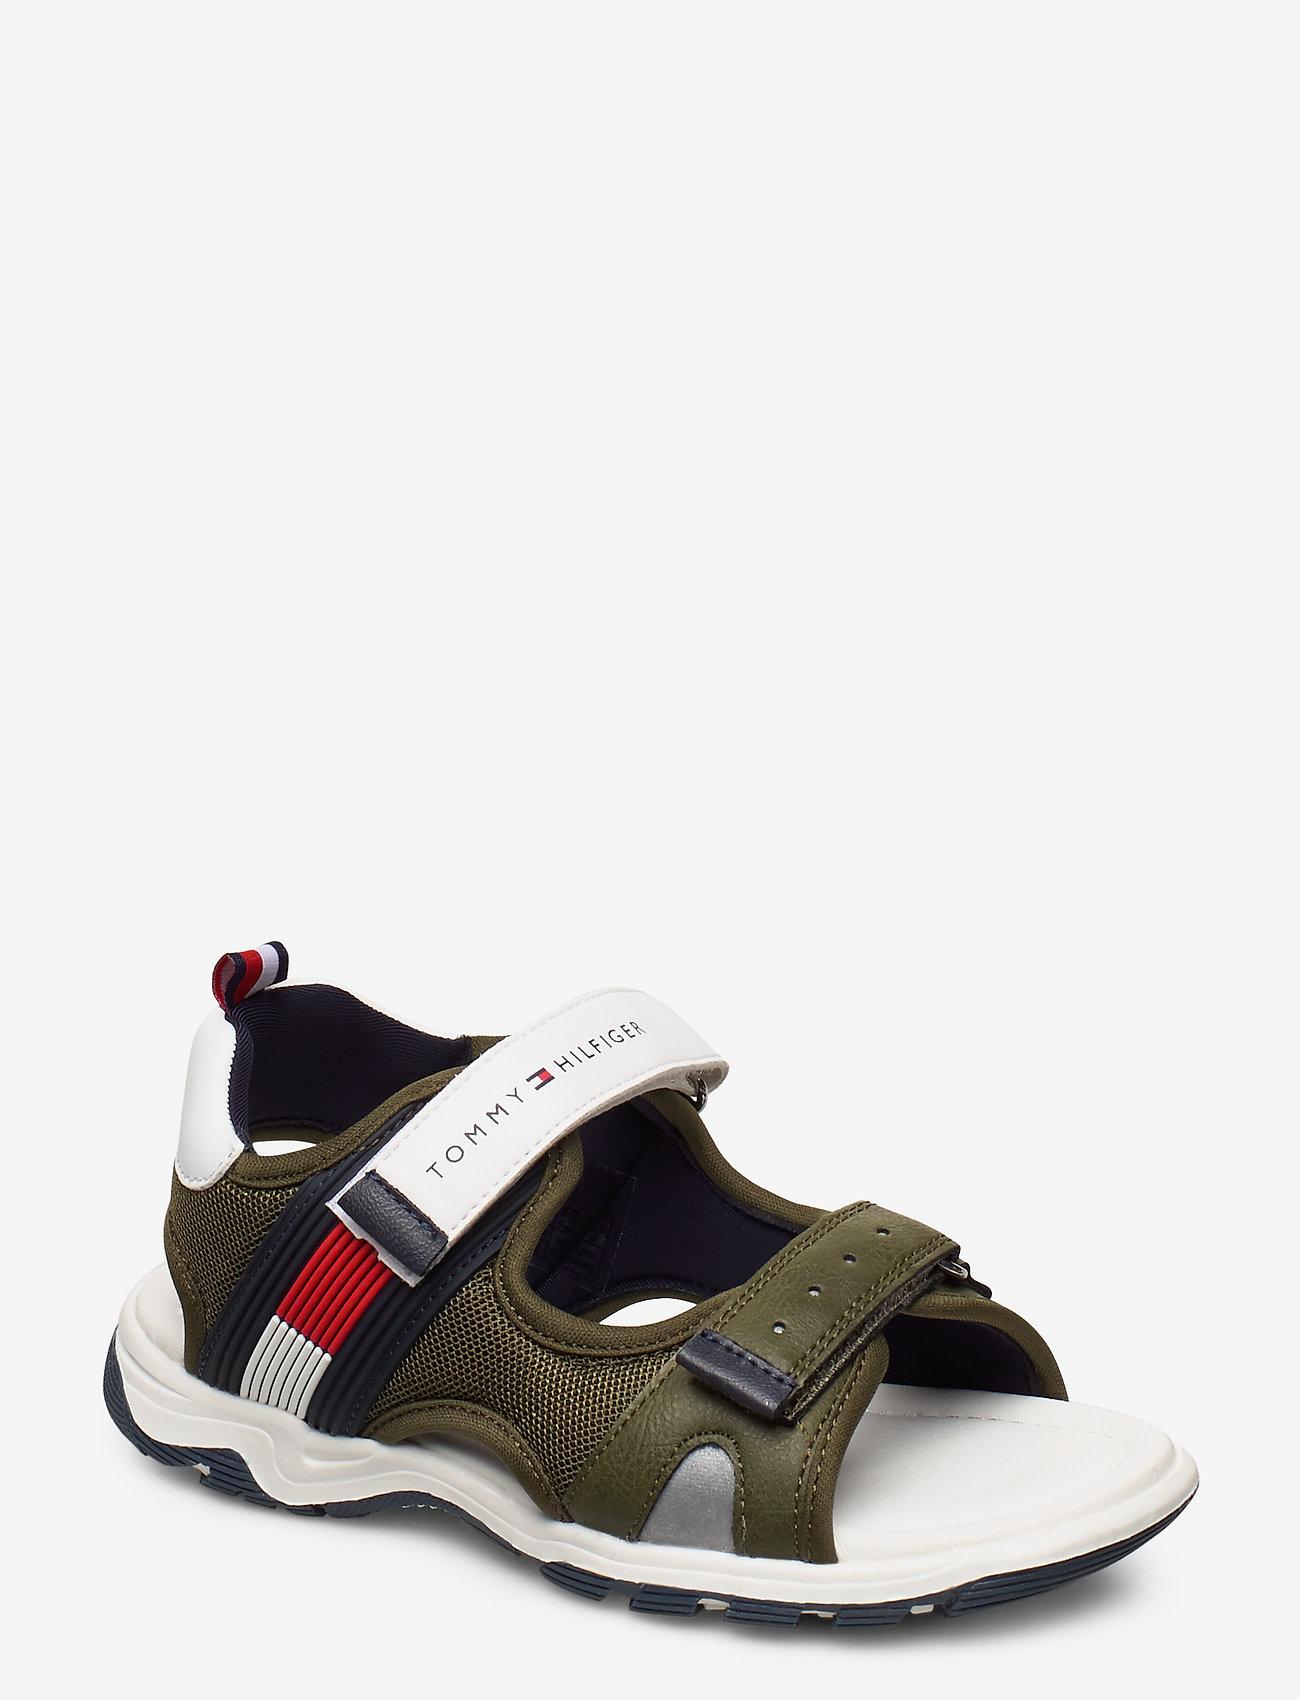 Tommy Hilfiger - VELCRO SANDAL - sandals - military green/white - 0